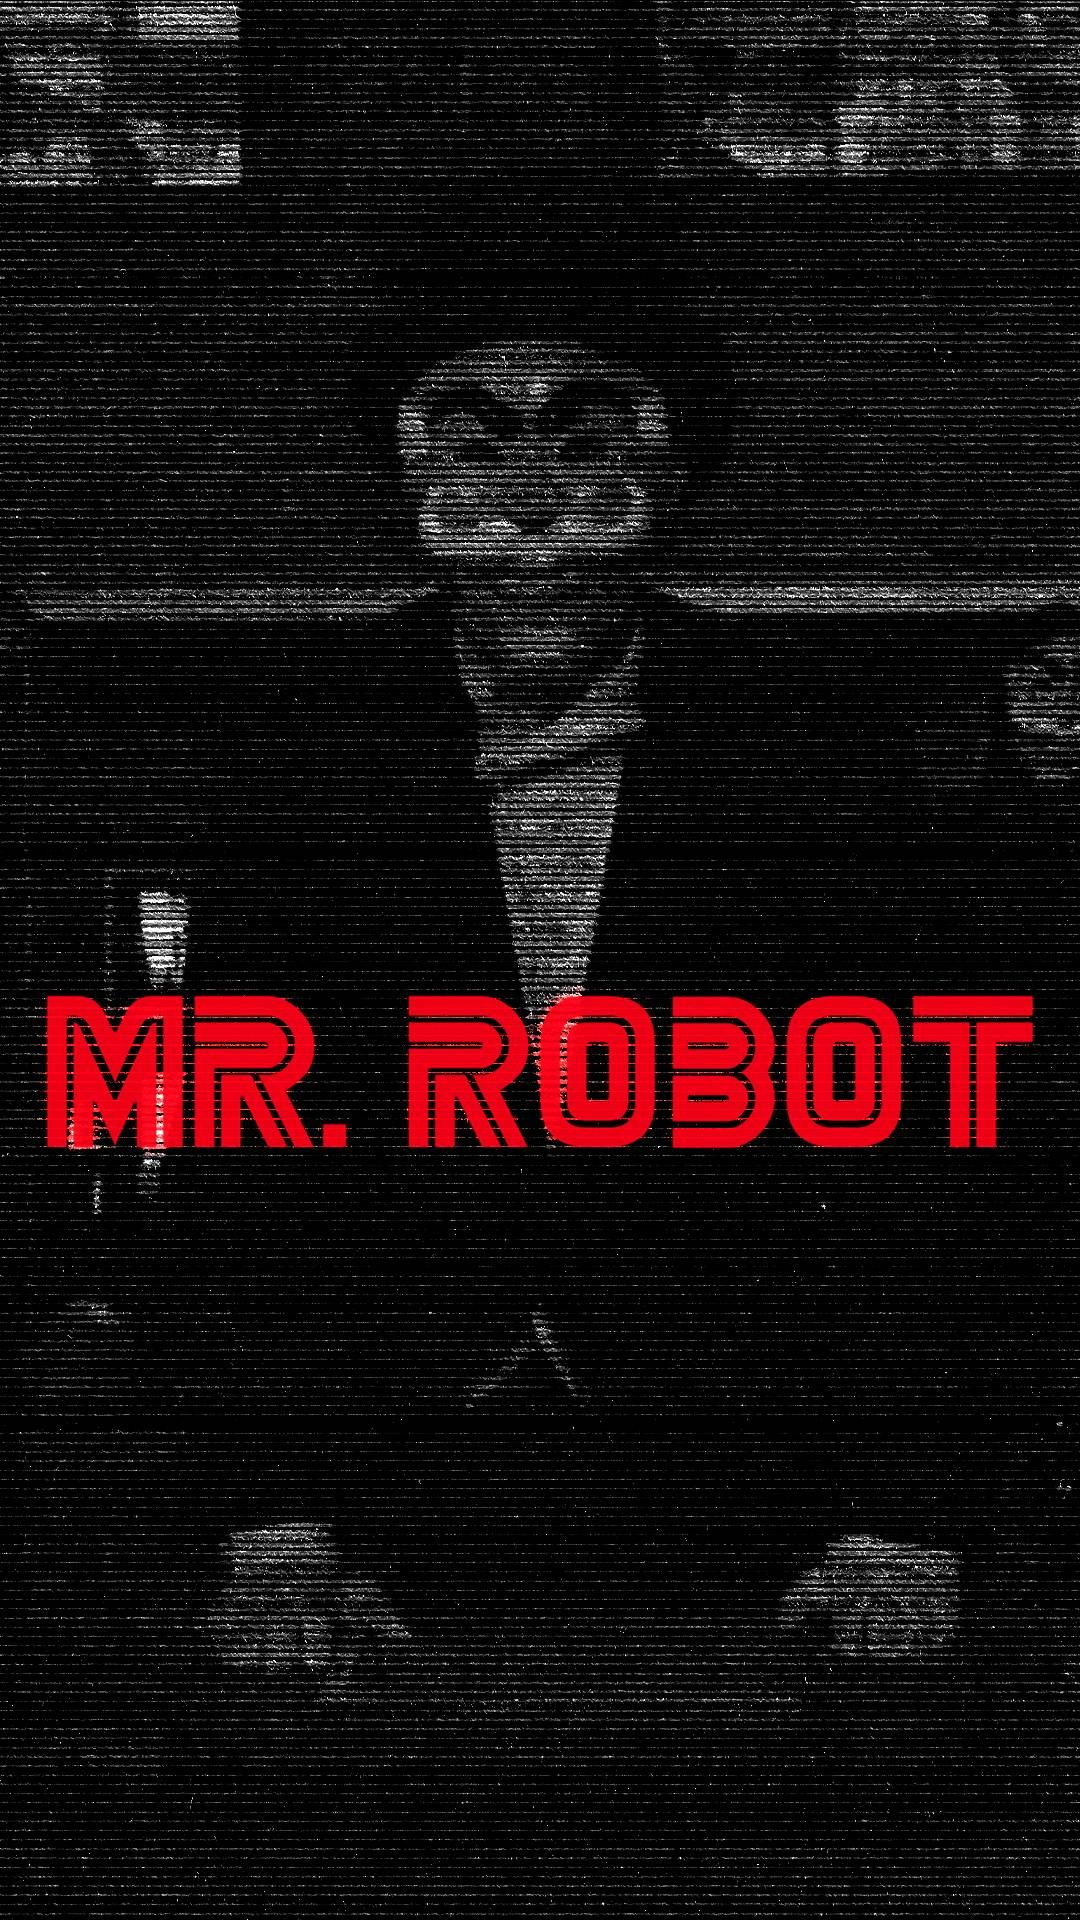 Mr Robot Wallpaper Robot Wallpaper Mr Robot Poster Mr Robot